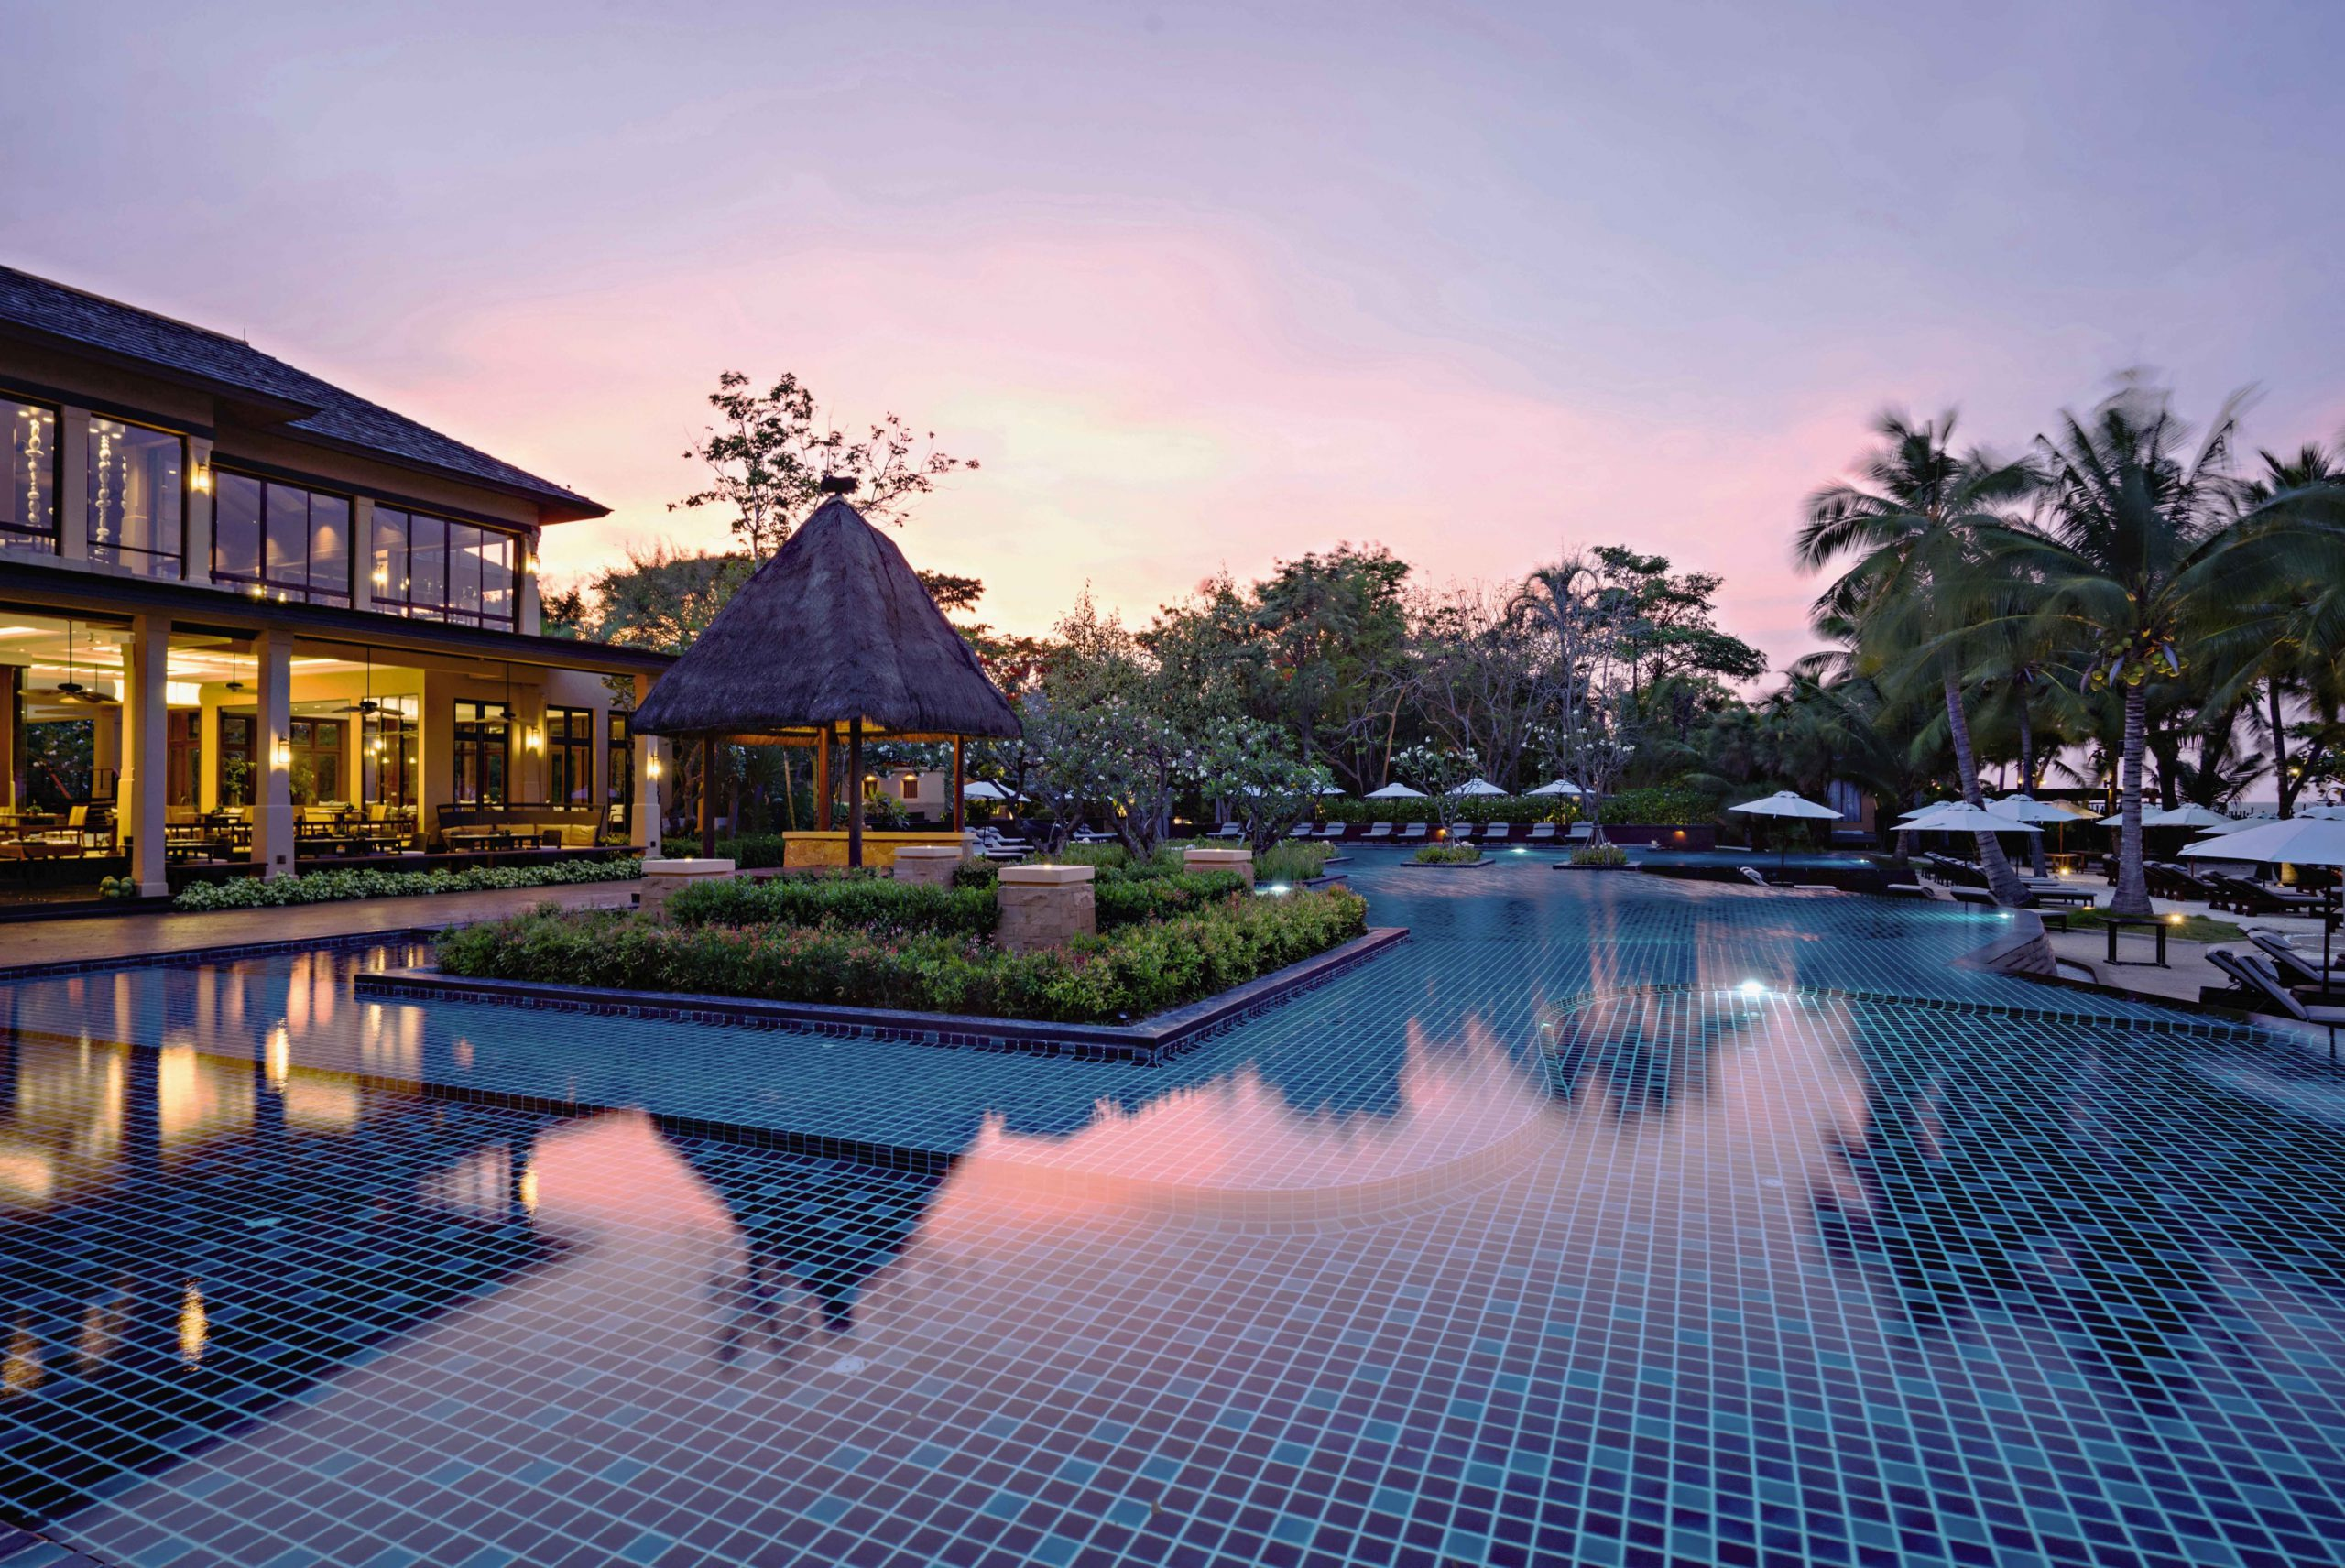 K43 Movenpick Asara Resort & Spa Hua Hin